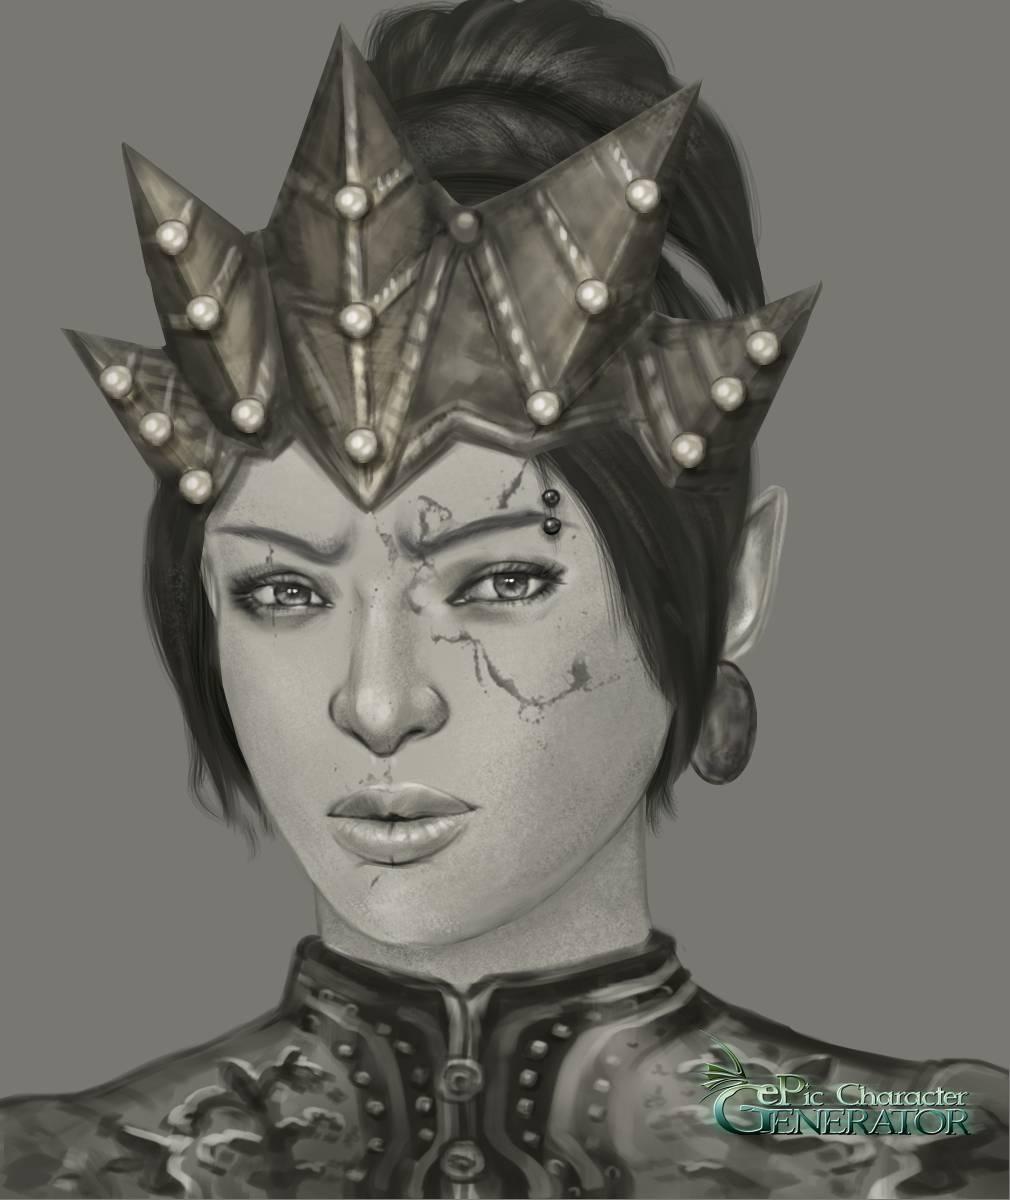 ePic Character Generator Season 3 Female Portrait Screenshot 07